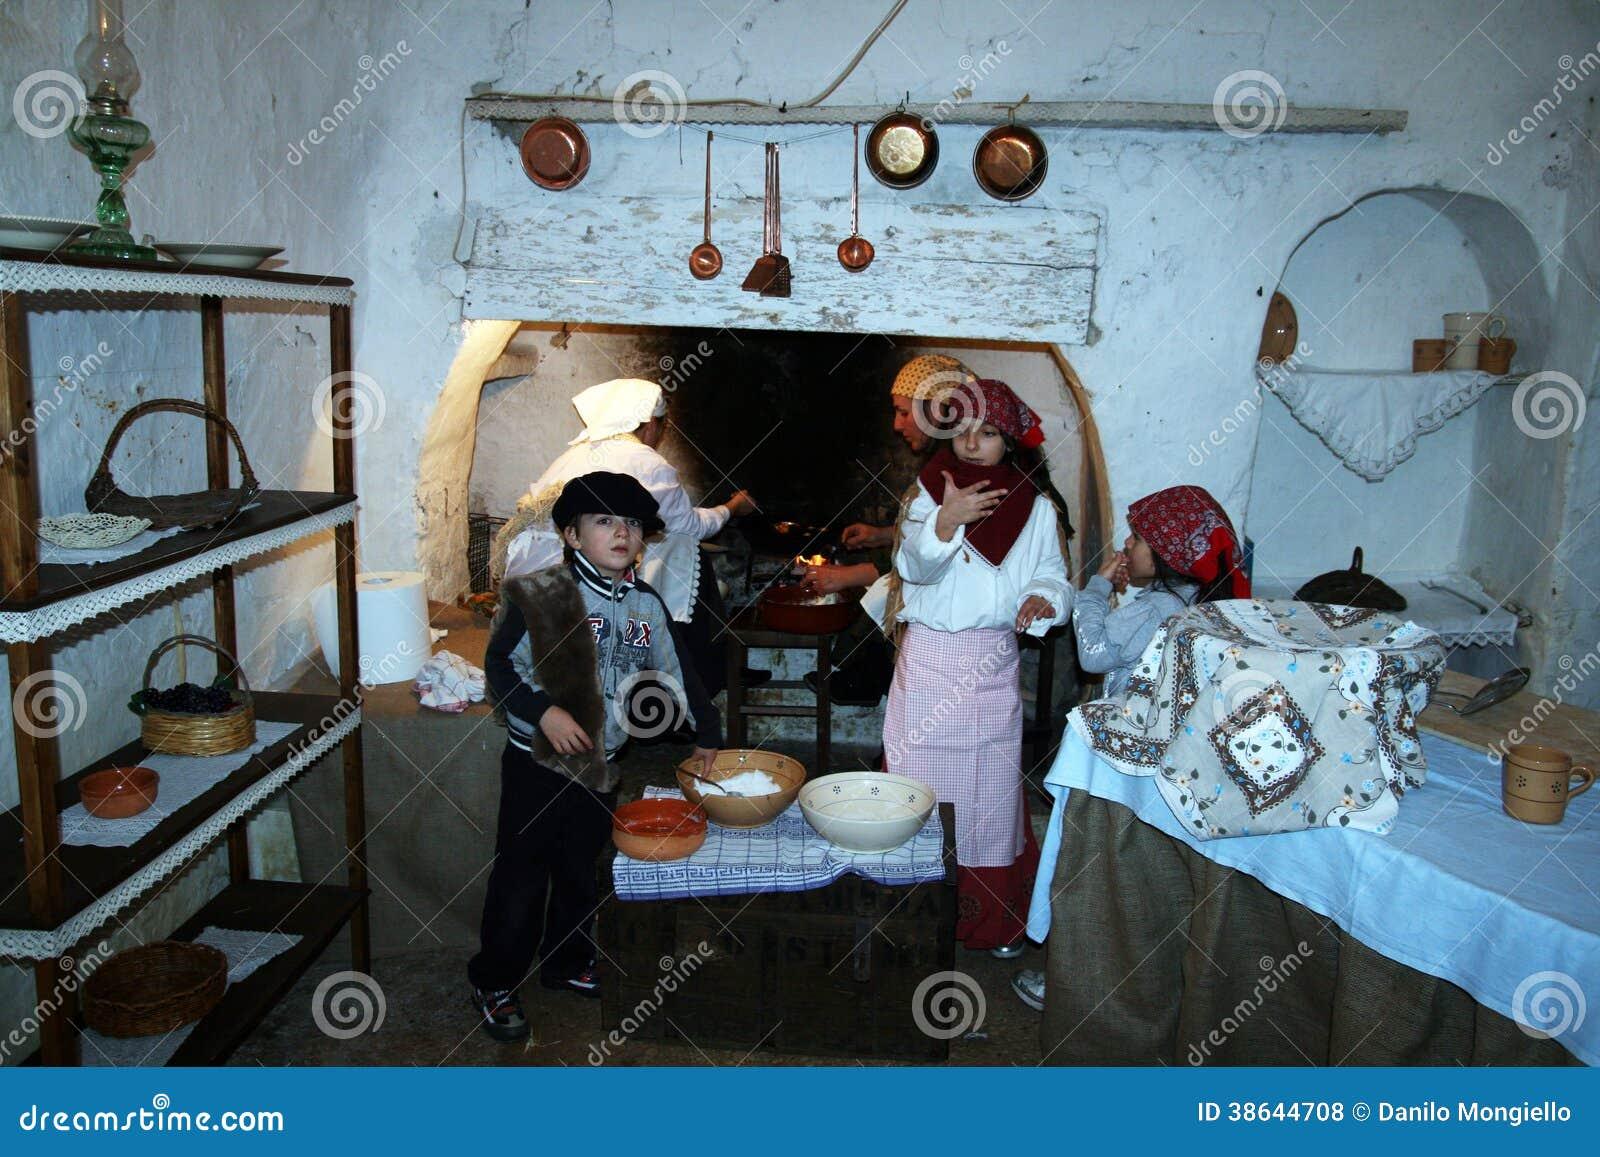 Oude keuken redactionele stock foto afbeelding 38644708 - Oude foto keuken ...